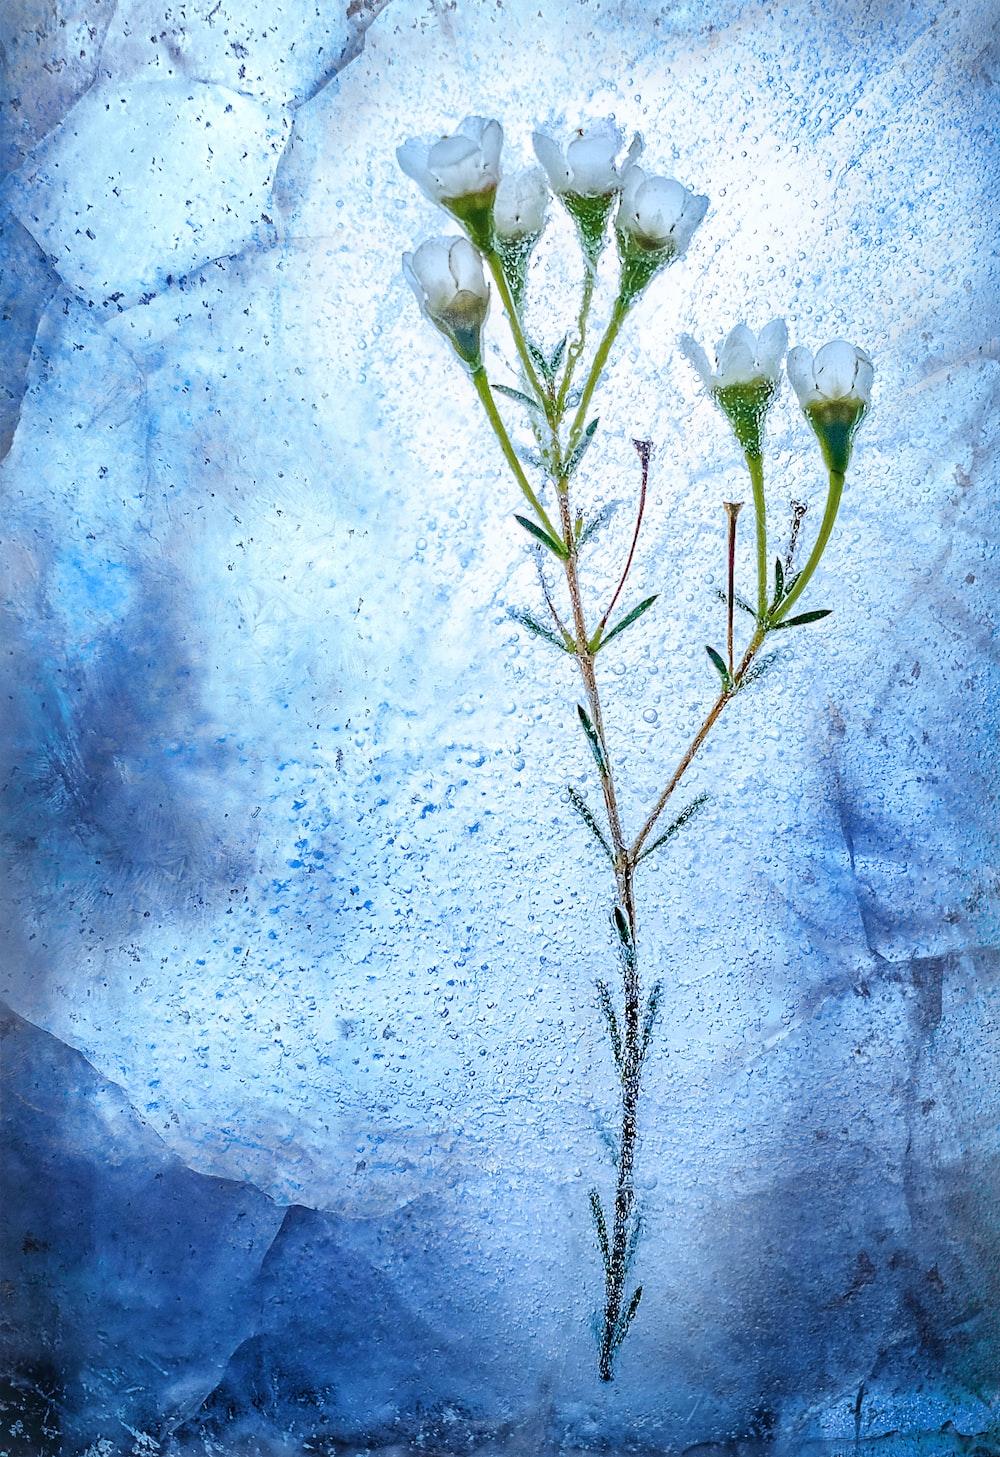 frozen white flowers